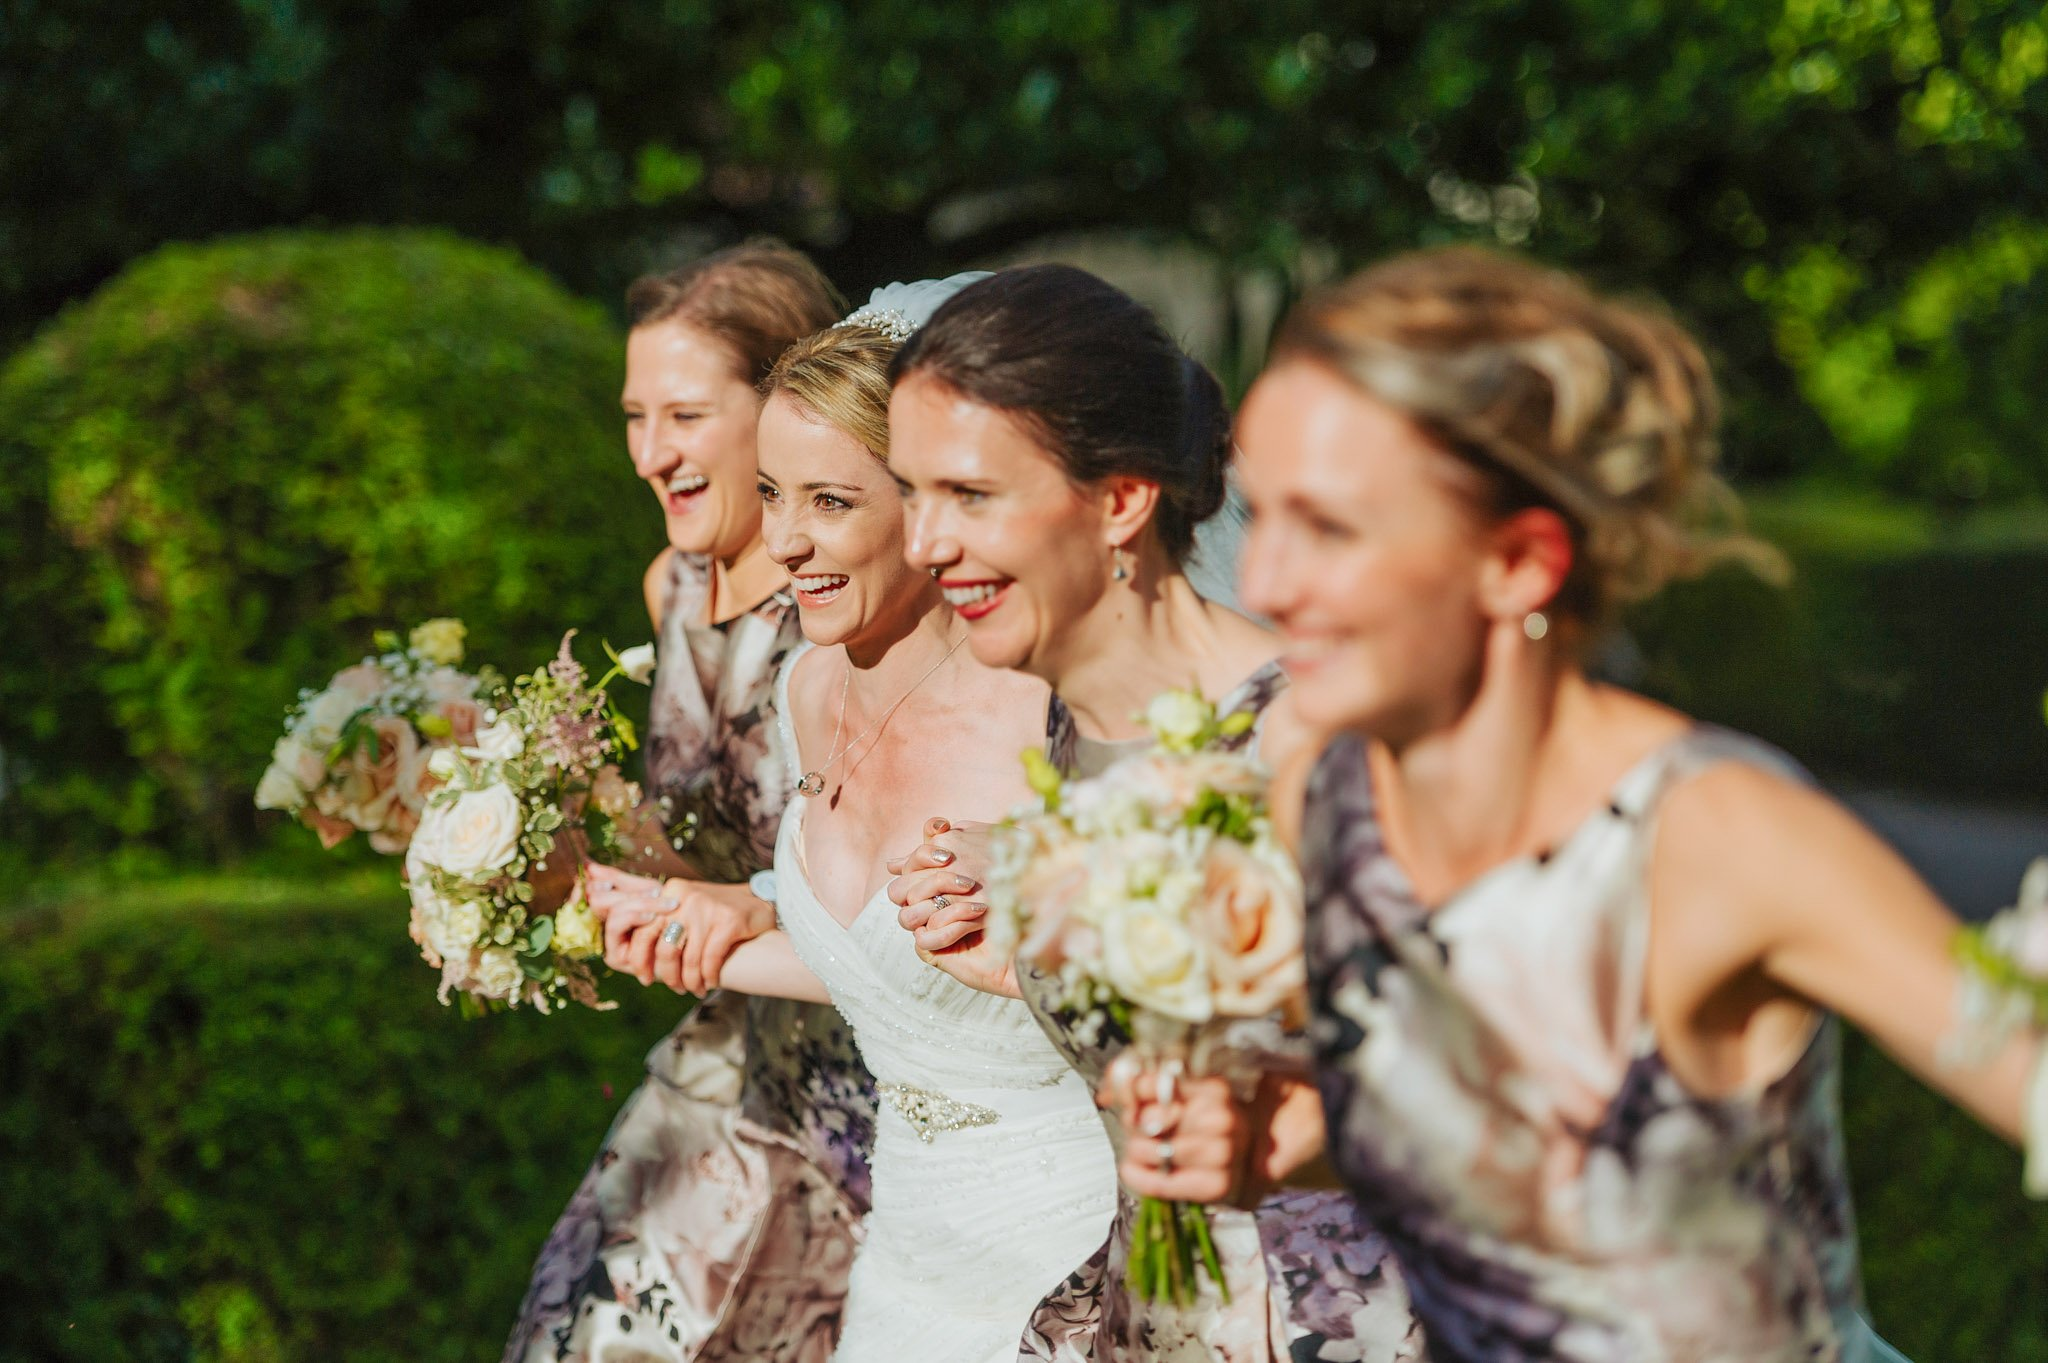 Georgina + Mike - Wedding photography in Malvern, Worcestershire 63